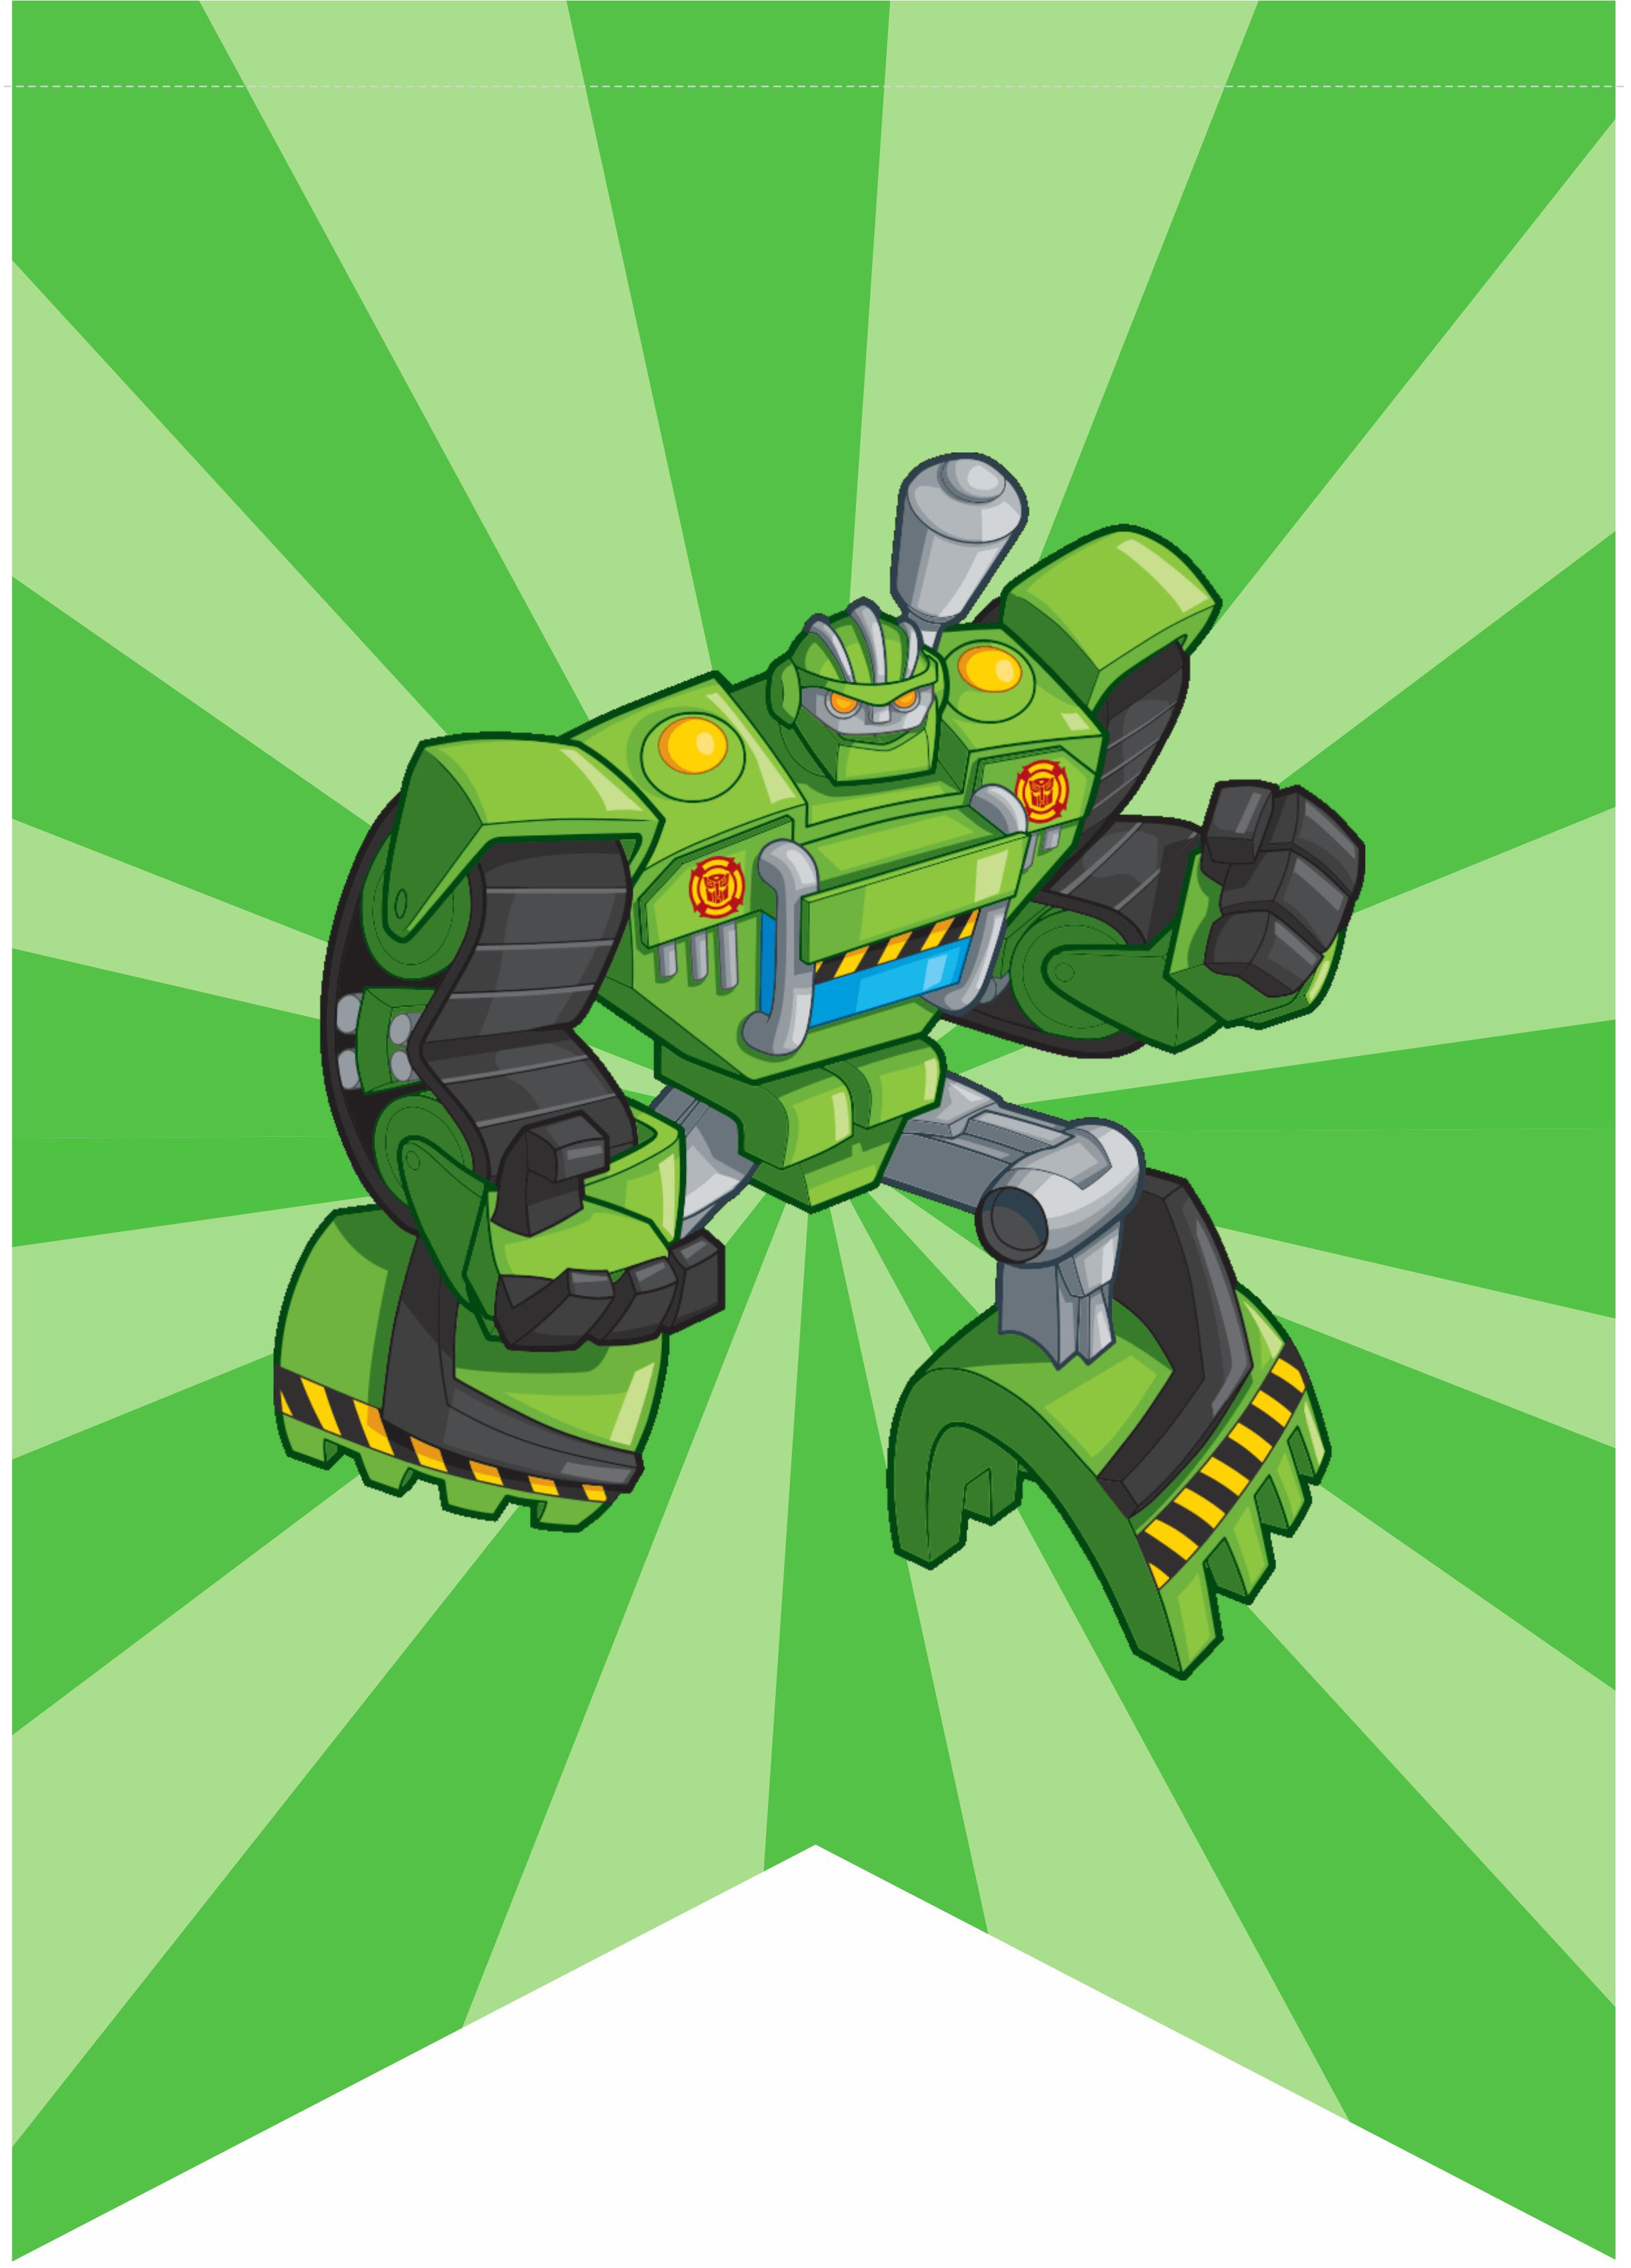 Bandeira Rescue Bots Boulder Transformers Rescue Bots Rescue Bots Rescue Bots Cake